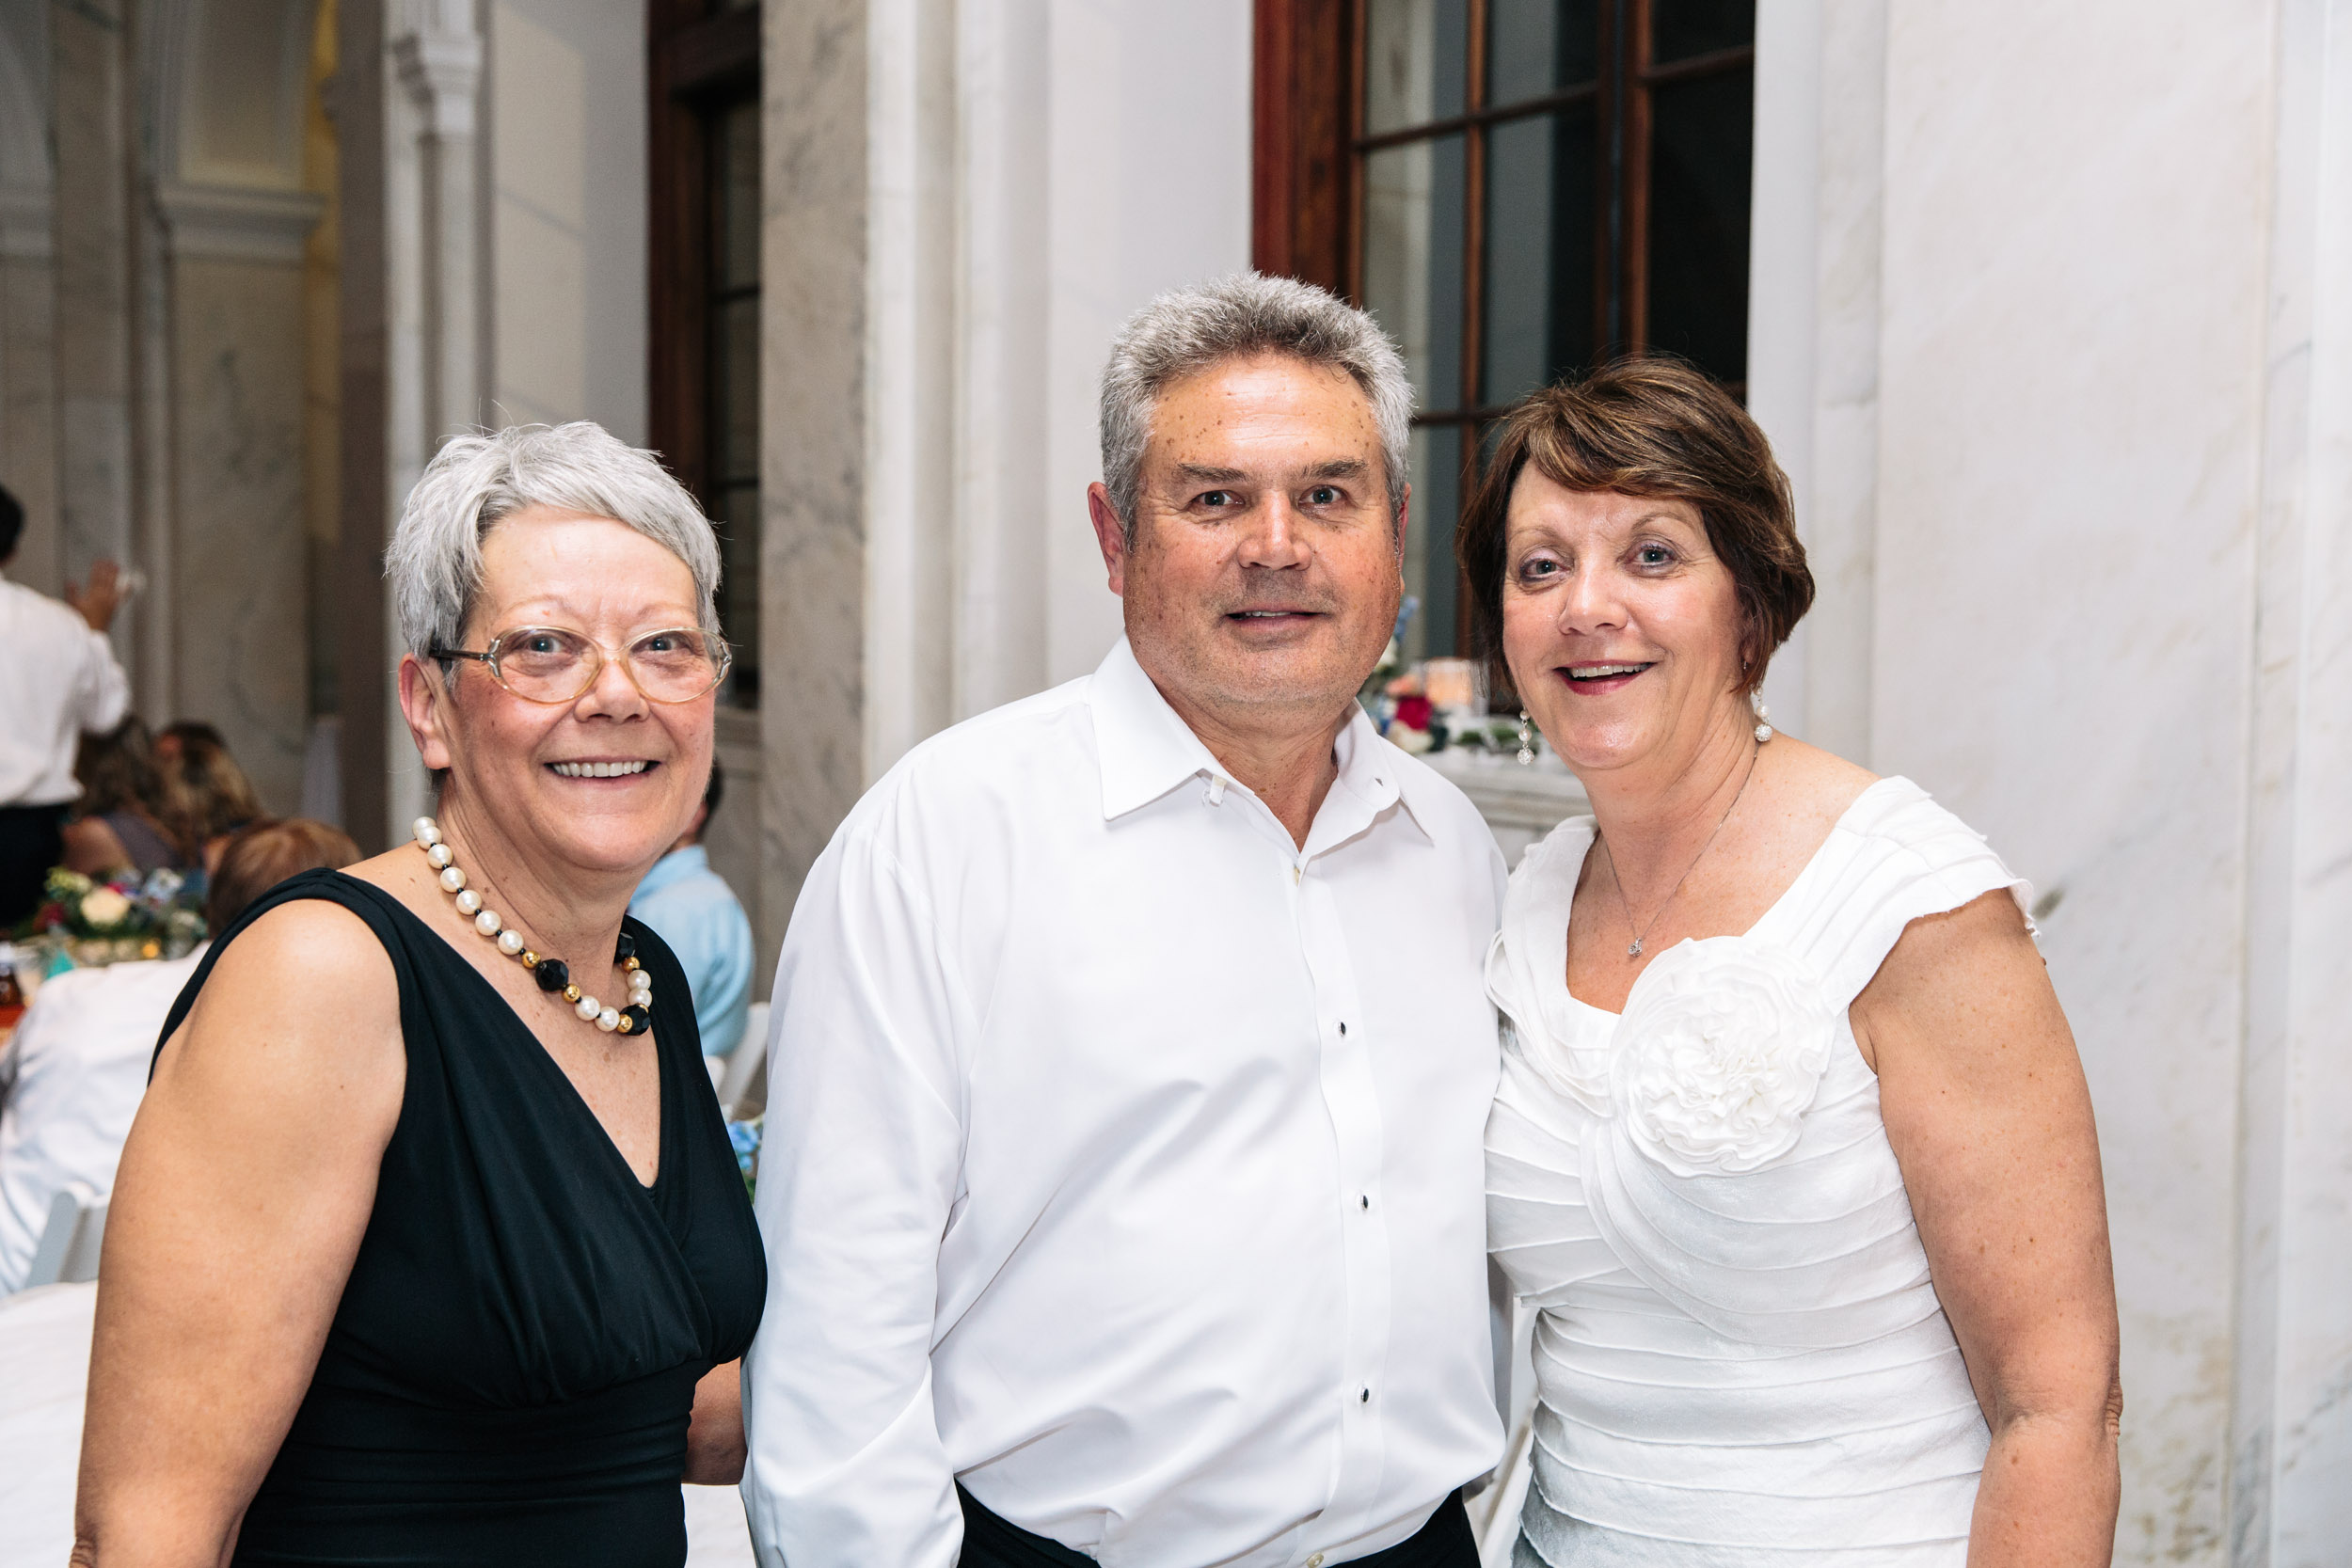 jimmy-rowalt-atlanta-wedding-photography-137.jpg